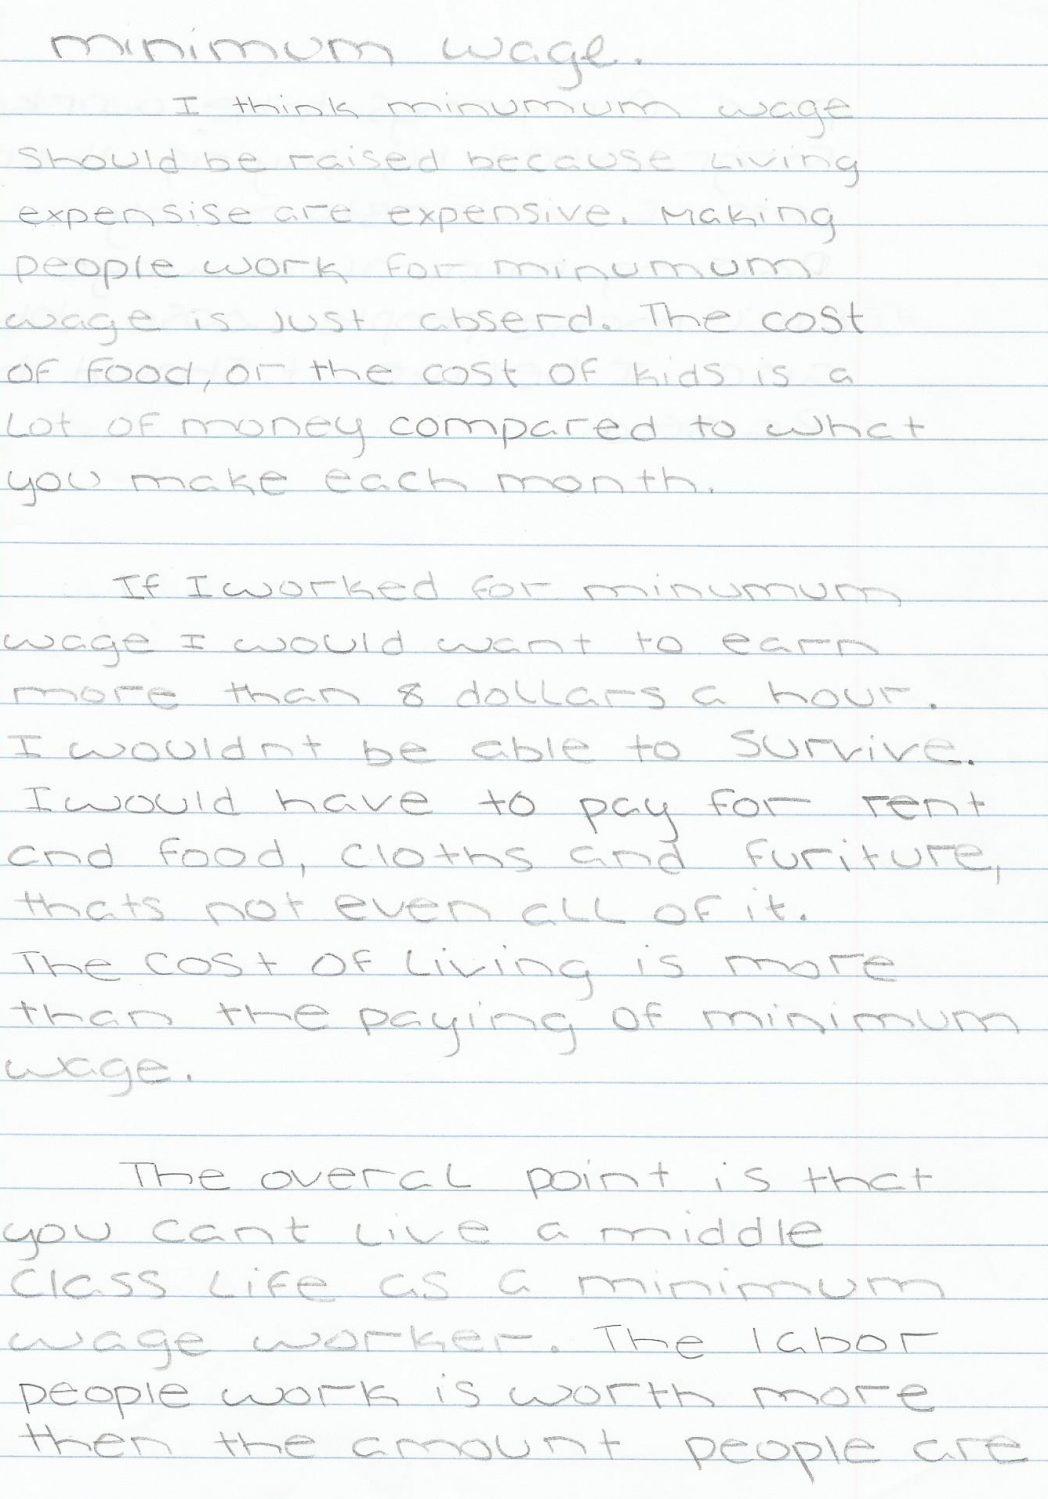 002 Essay Example On Minimum Wage Should Raised Write Schola Increase Argumentative Raising Beautiful Free Full